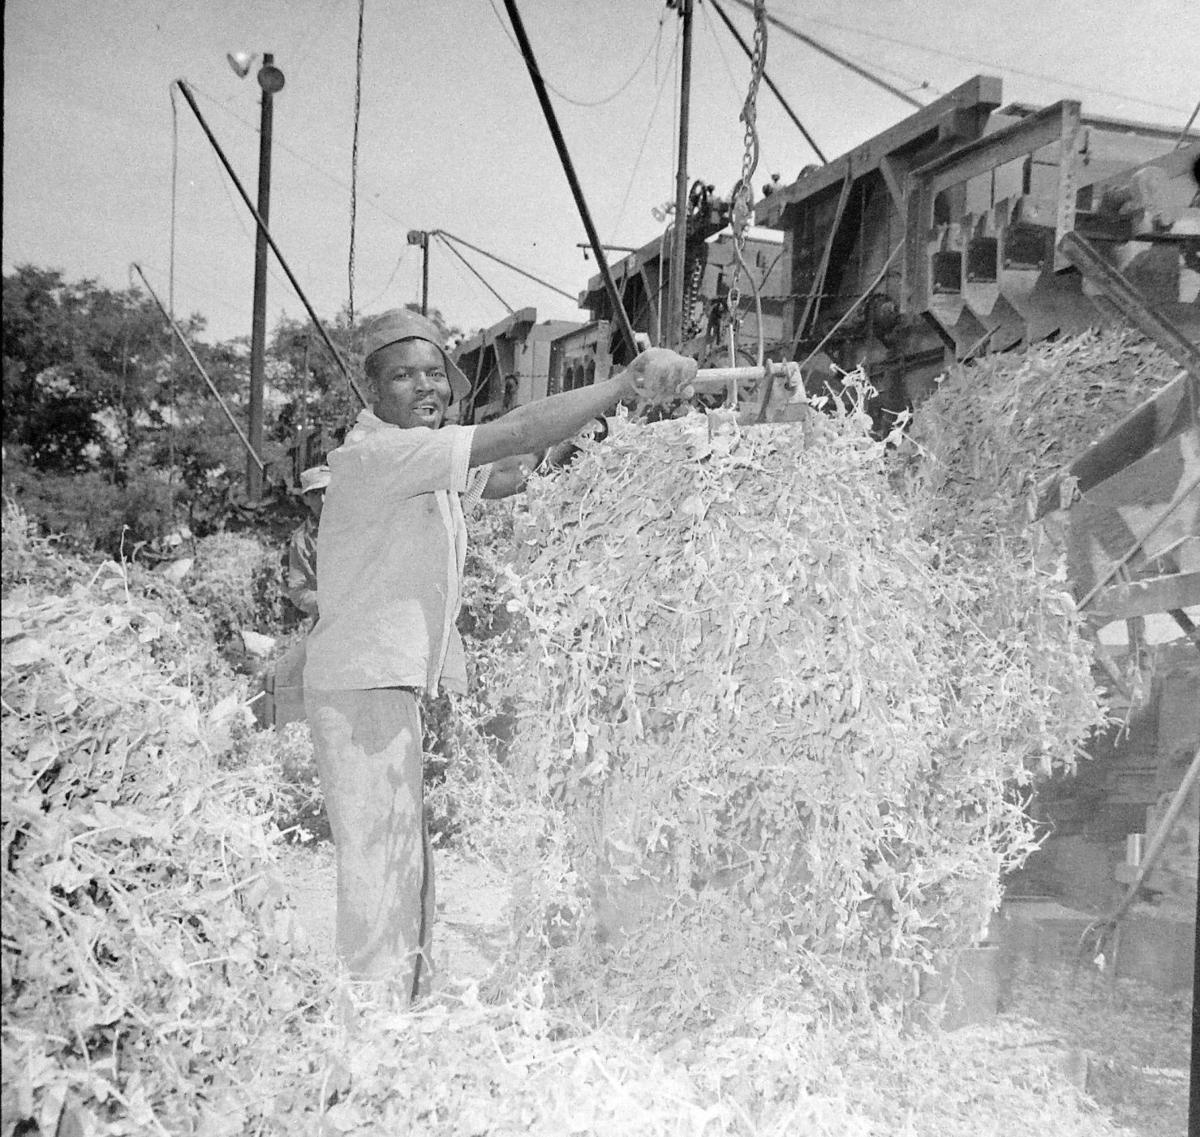 Smith Frozen Foods pea harvest processing, Jul 2 1957 (2).jpg